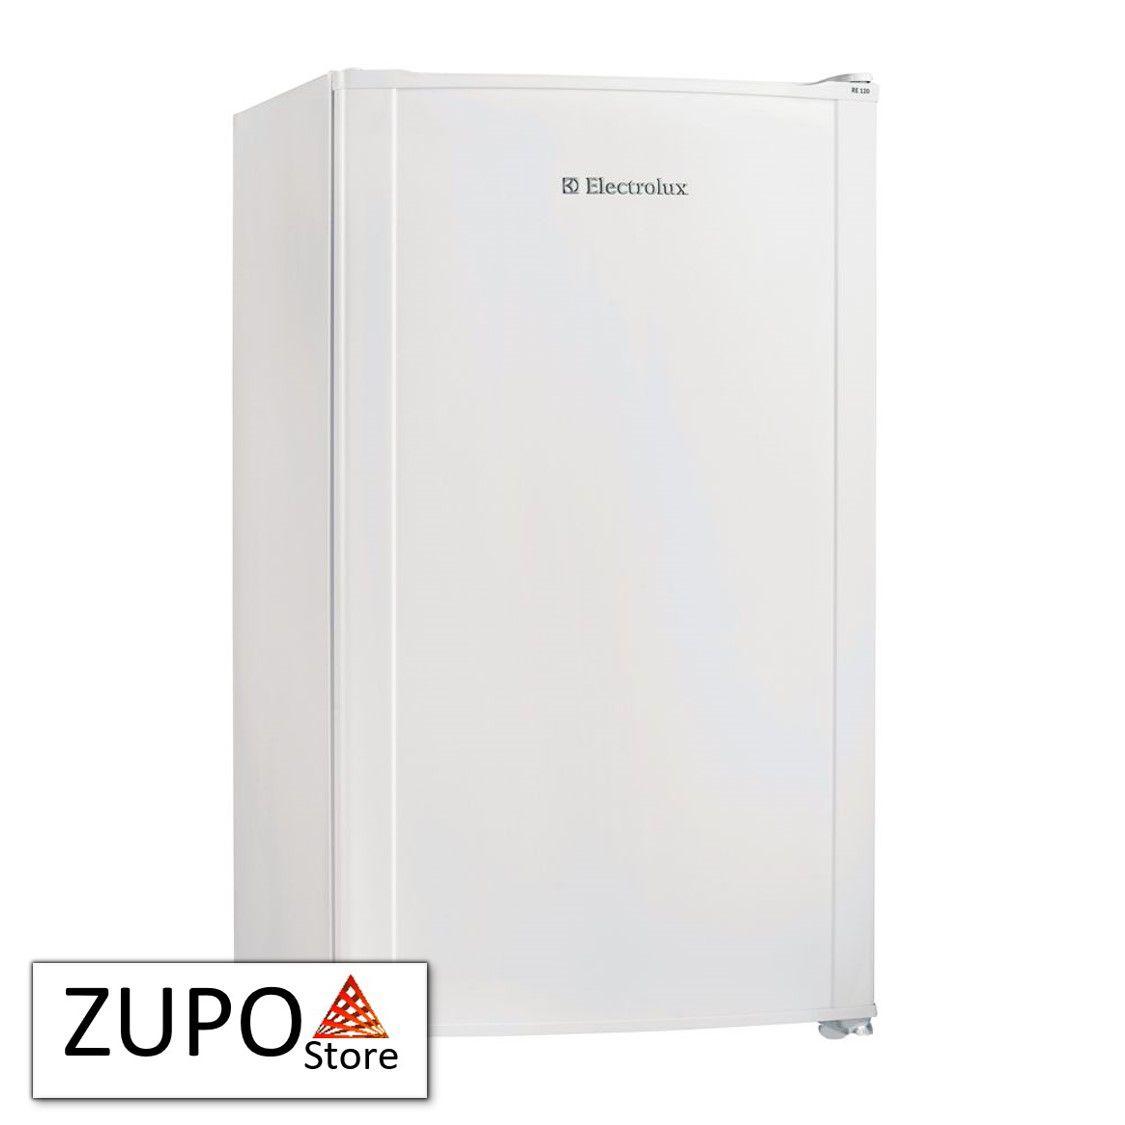 Frigobar Electrolux 122 Litros Branco - RE120 - 127V